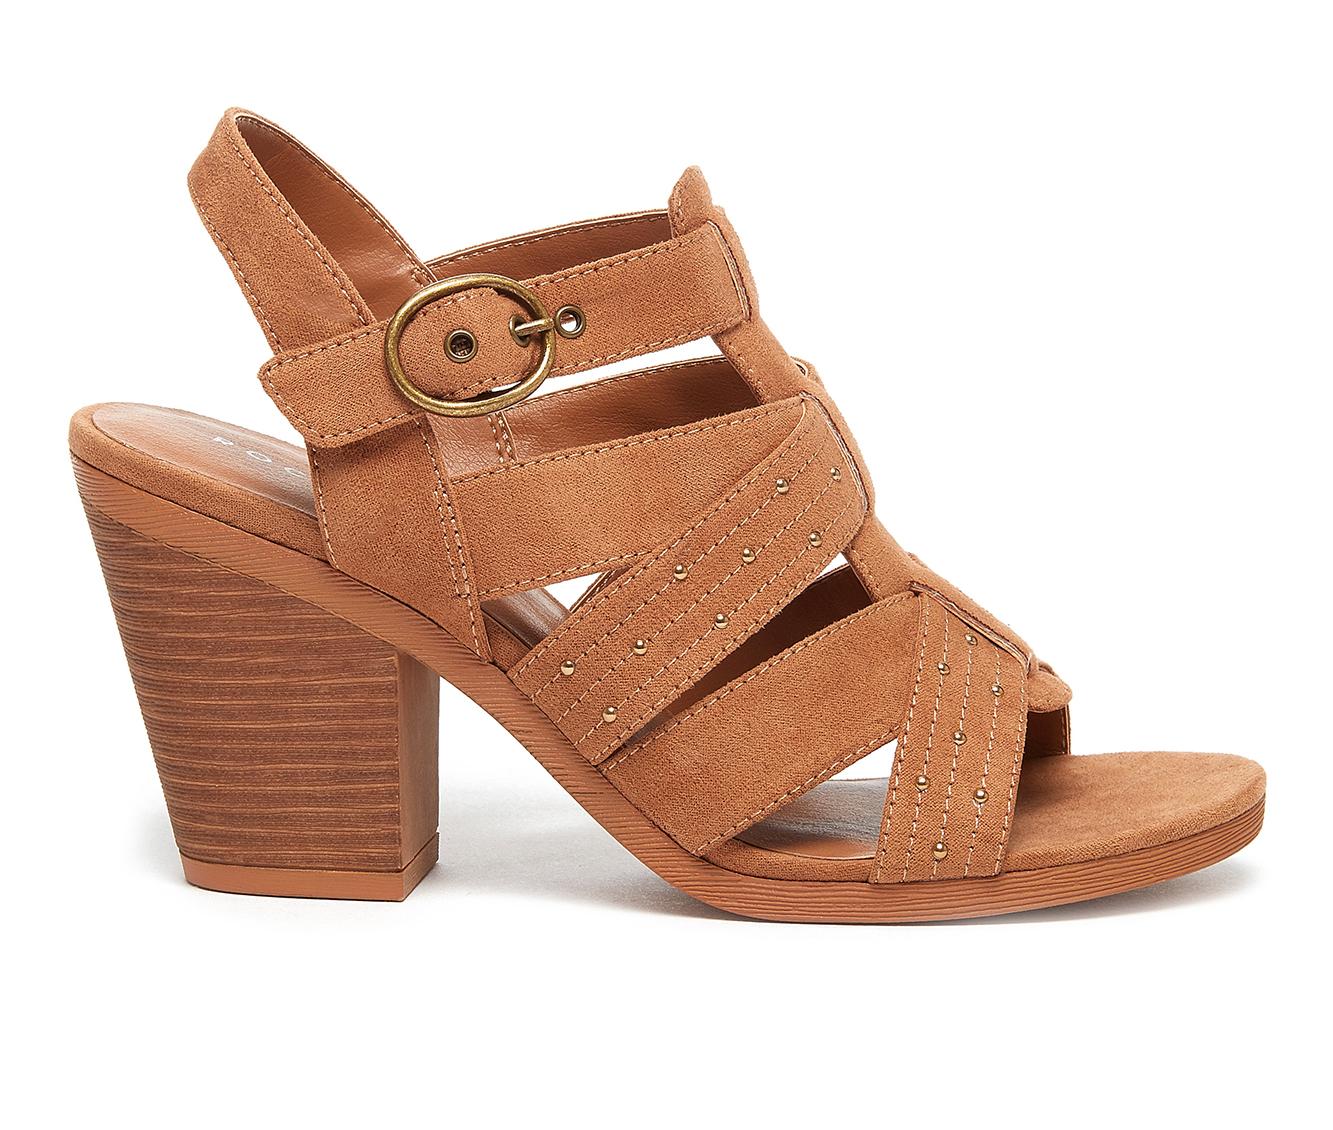 Rocket Dog Yeehaw Women's Dress Shoe (Brown Faux Leather)